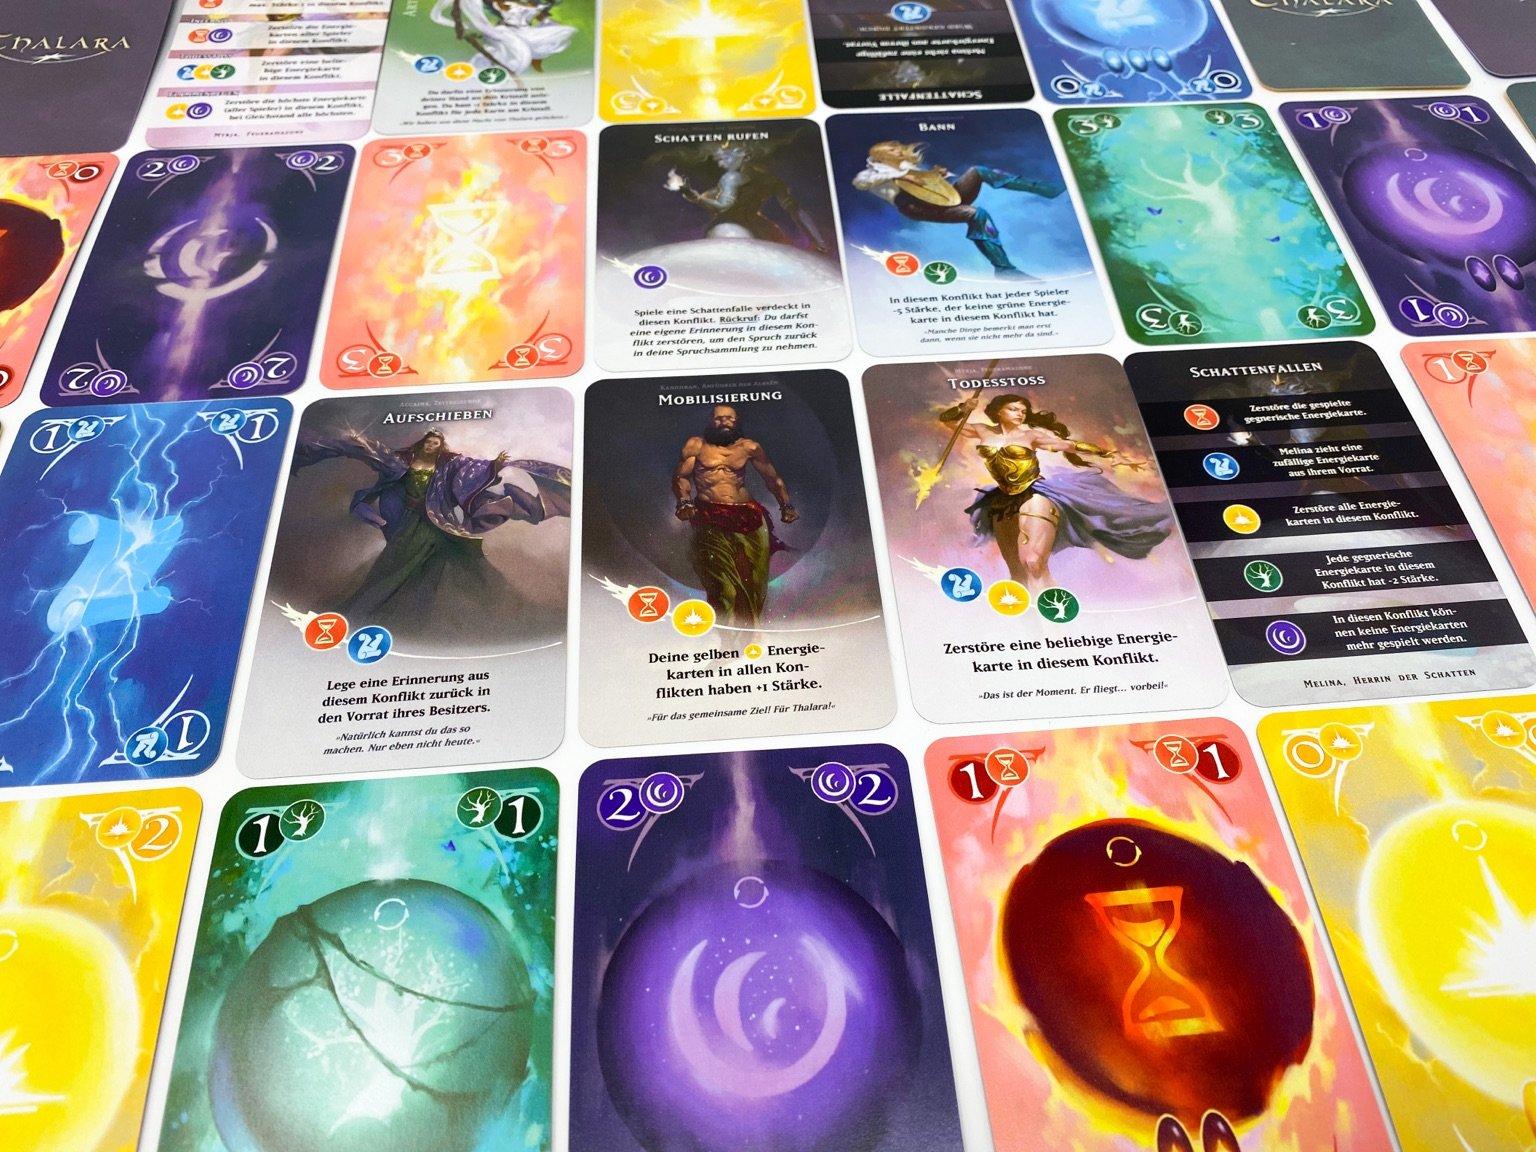 Thalara cards